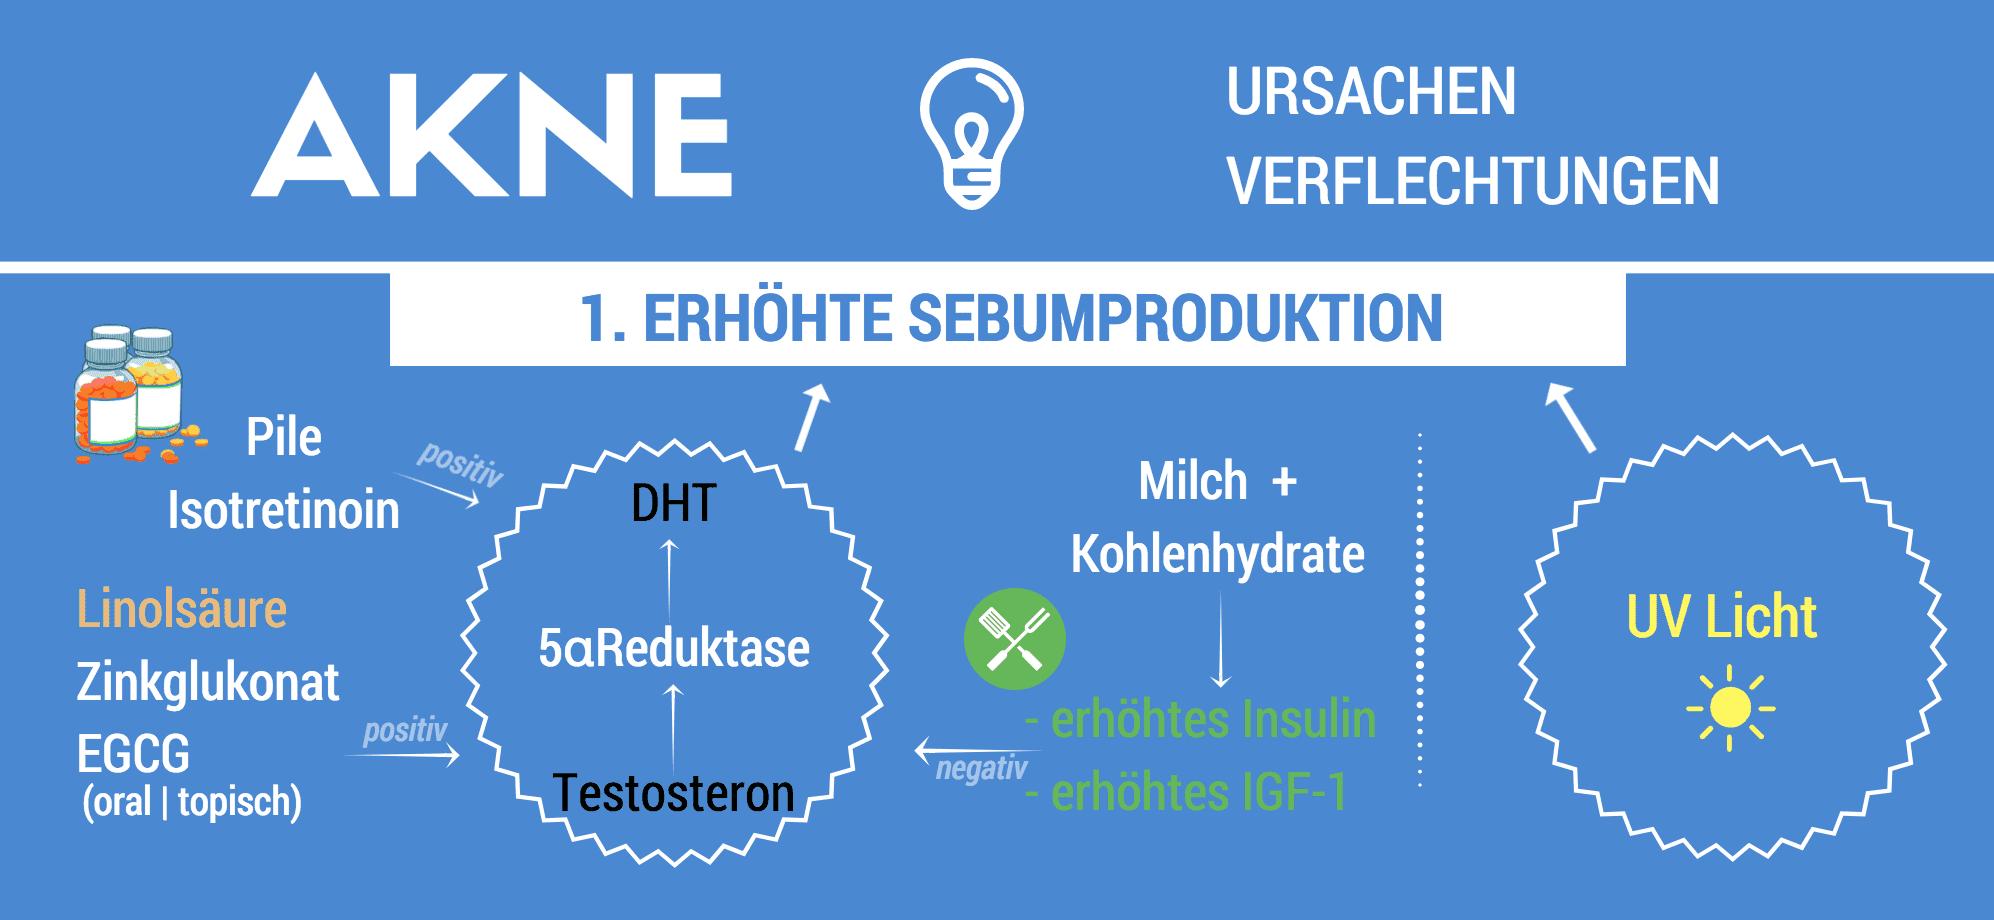 Akne_Ursachen_Infografik